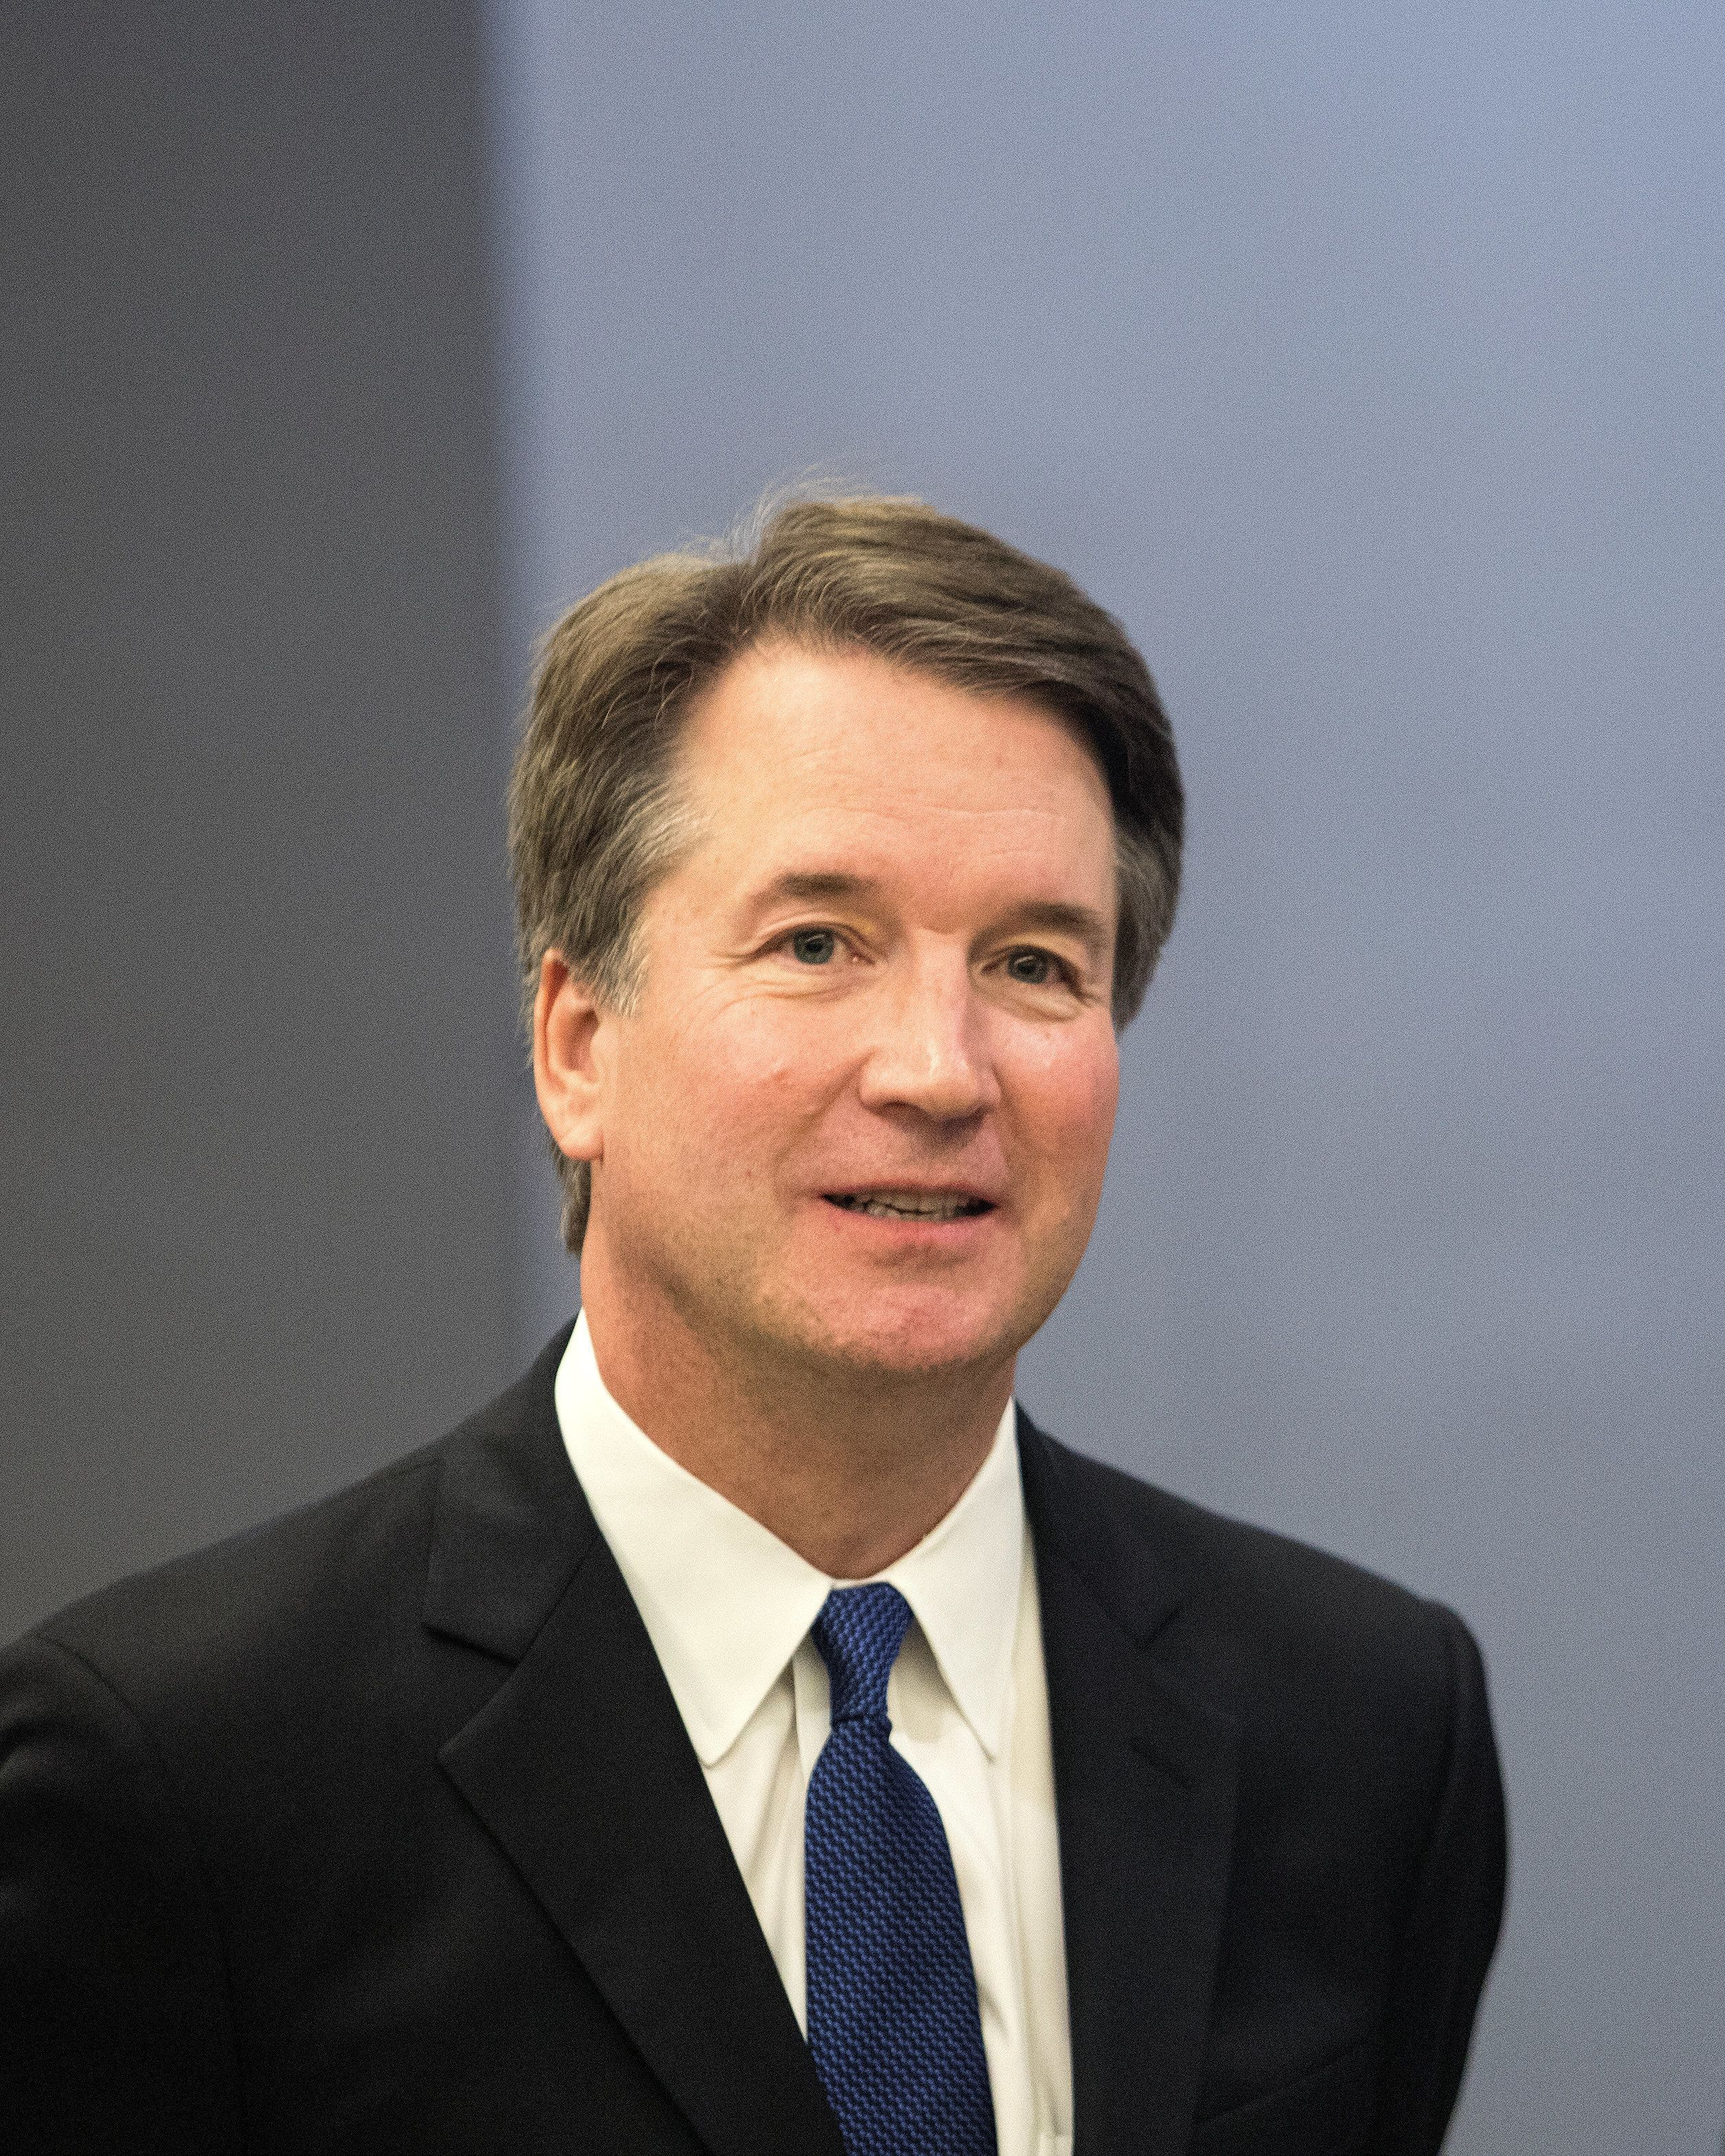 U.S. Supreme Court  nominee Brett Kavanaugh seen before meeting with U.S. Senator Amy Klobuchar at the Hart Senate Office Building in Washington, U.S.,  August 21, 2018. REUTERS/Alex Wroblewski